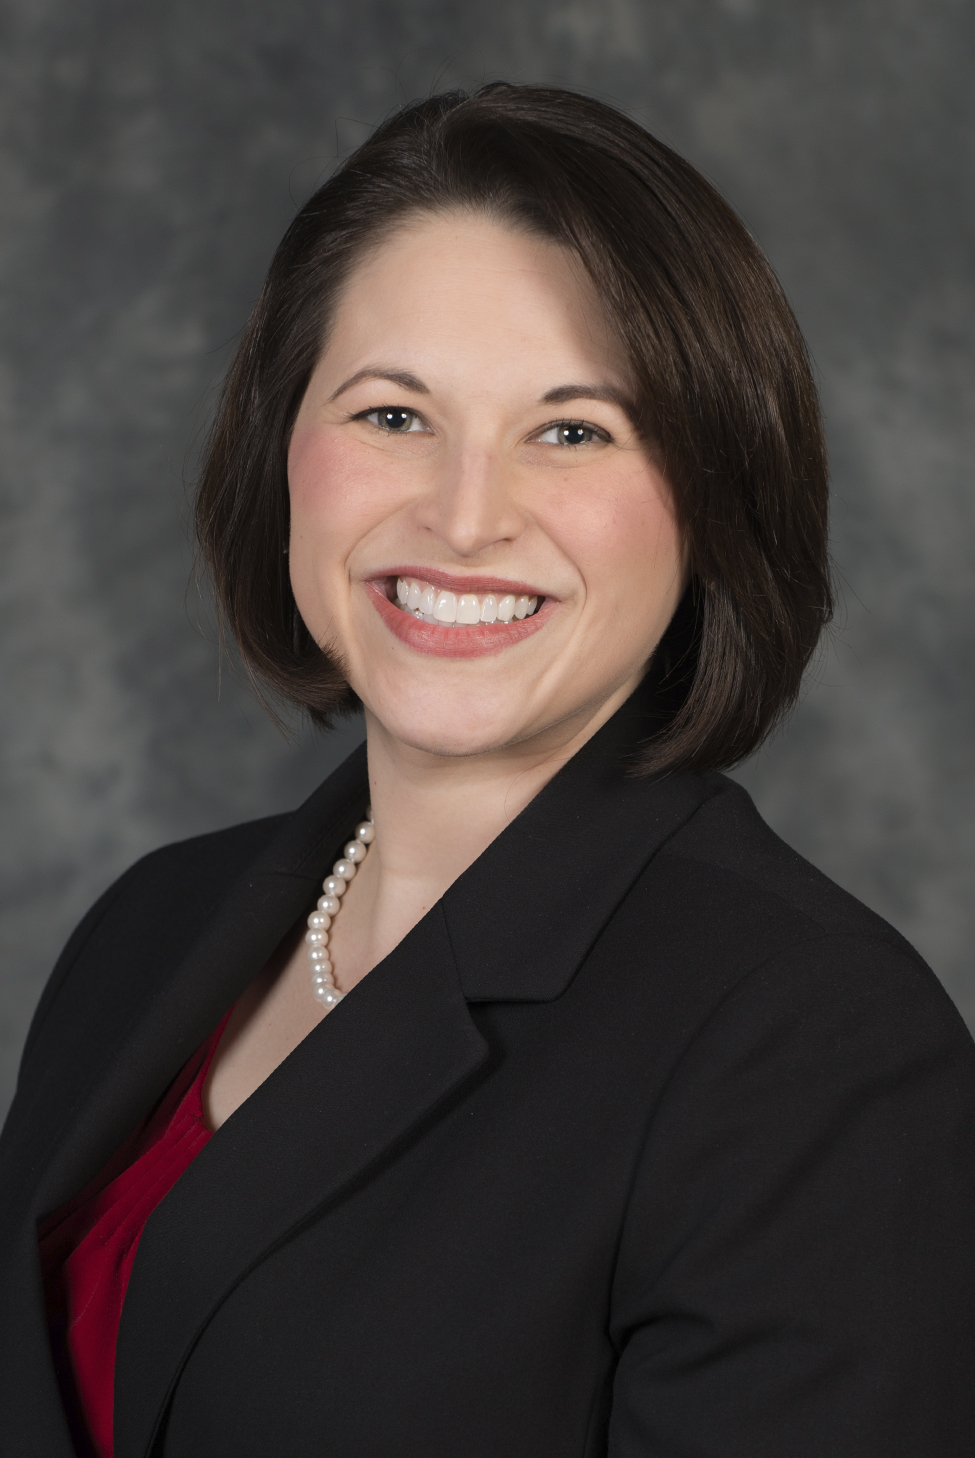 Amanda Maggard Named Ceo For Florida Hospital Zephyrhills